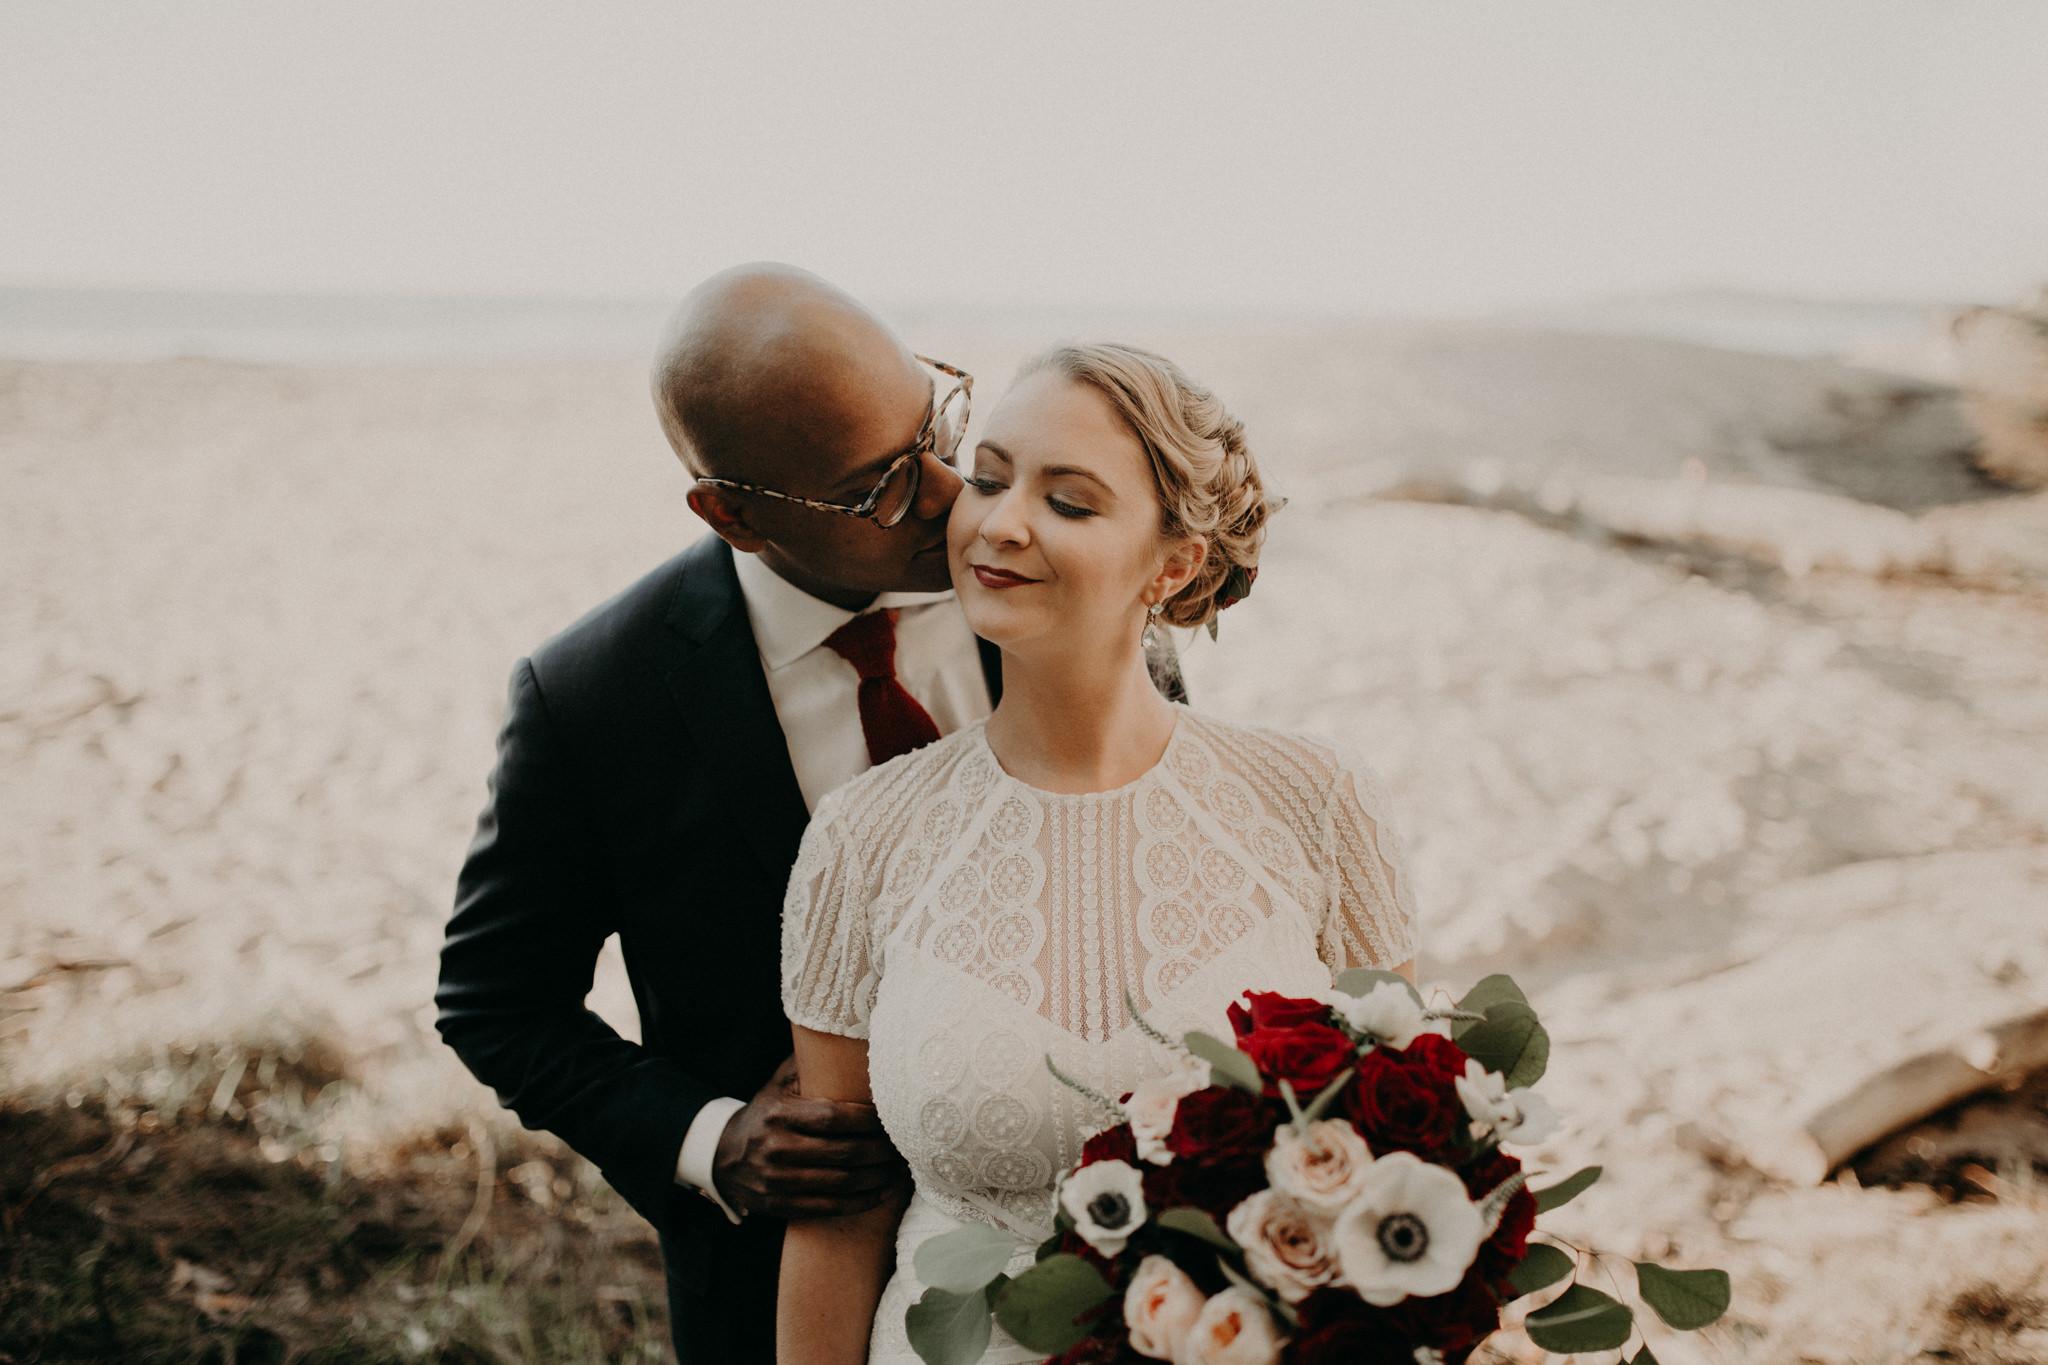 couple-wedding-carmel-wedding-53.jpg